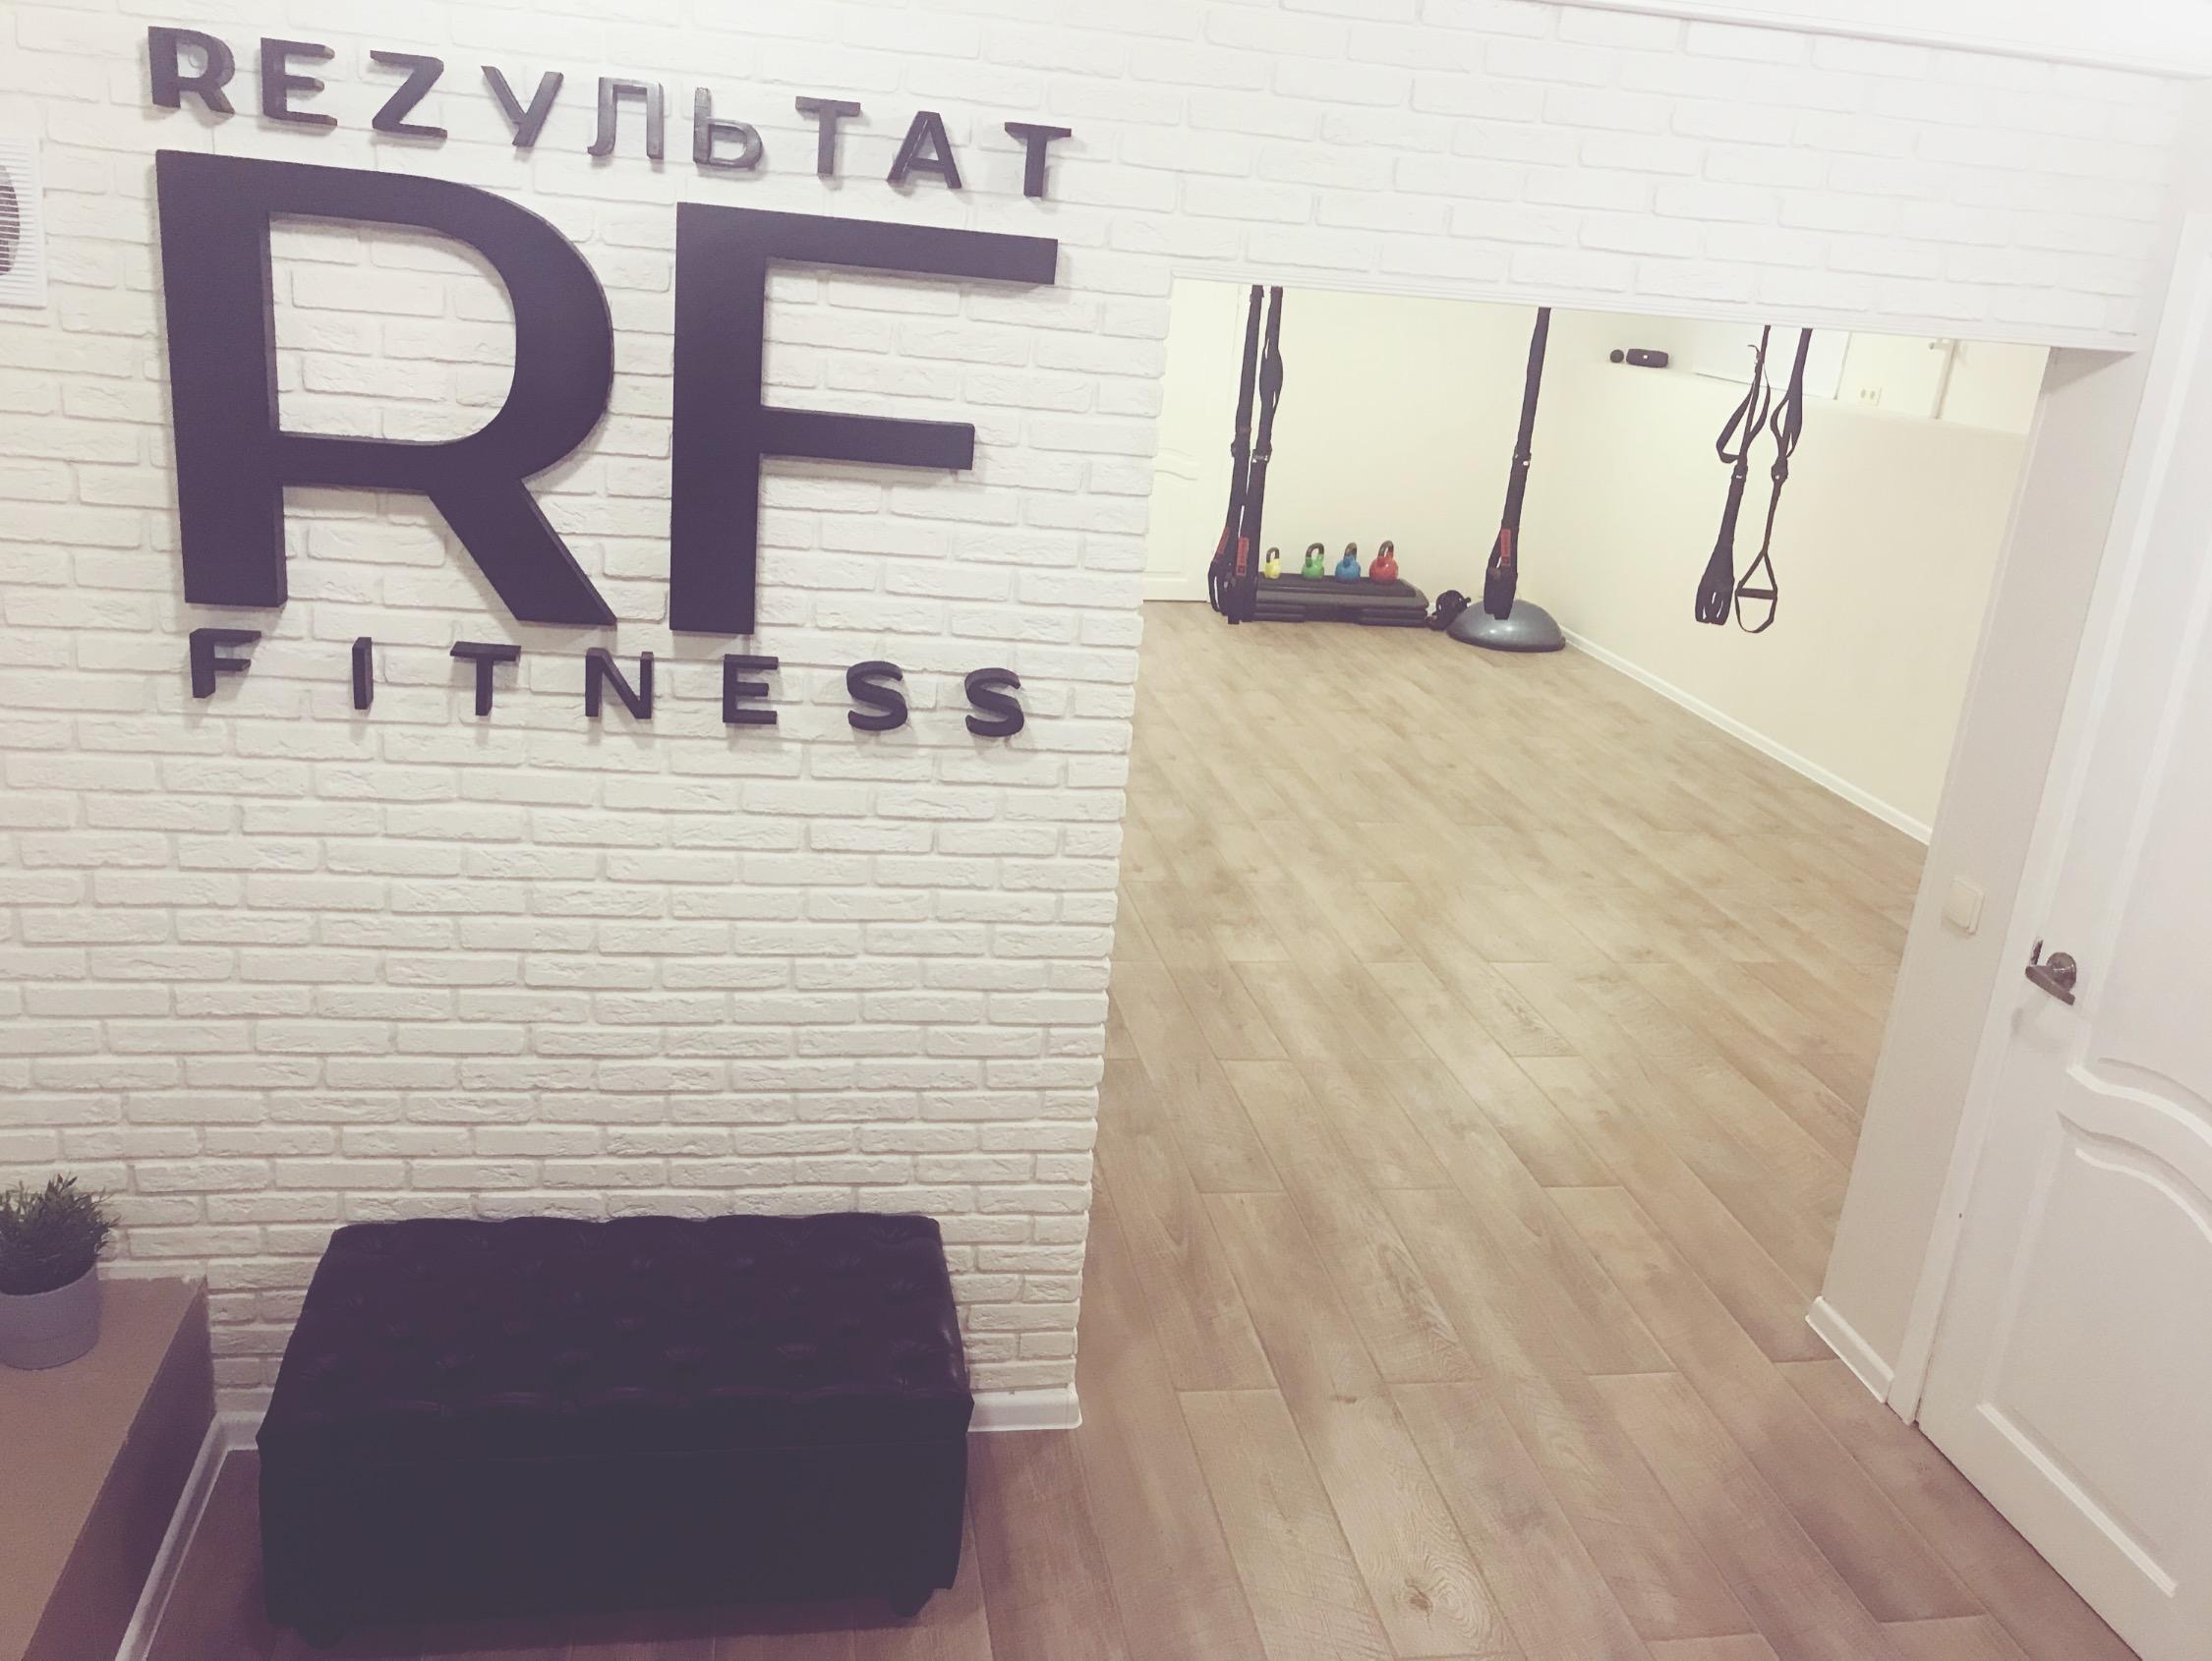 REZультат Fitness Studio